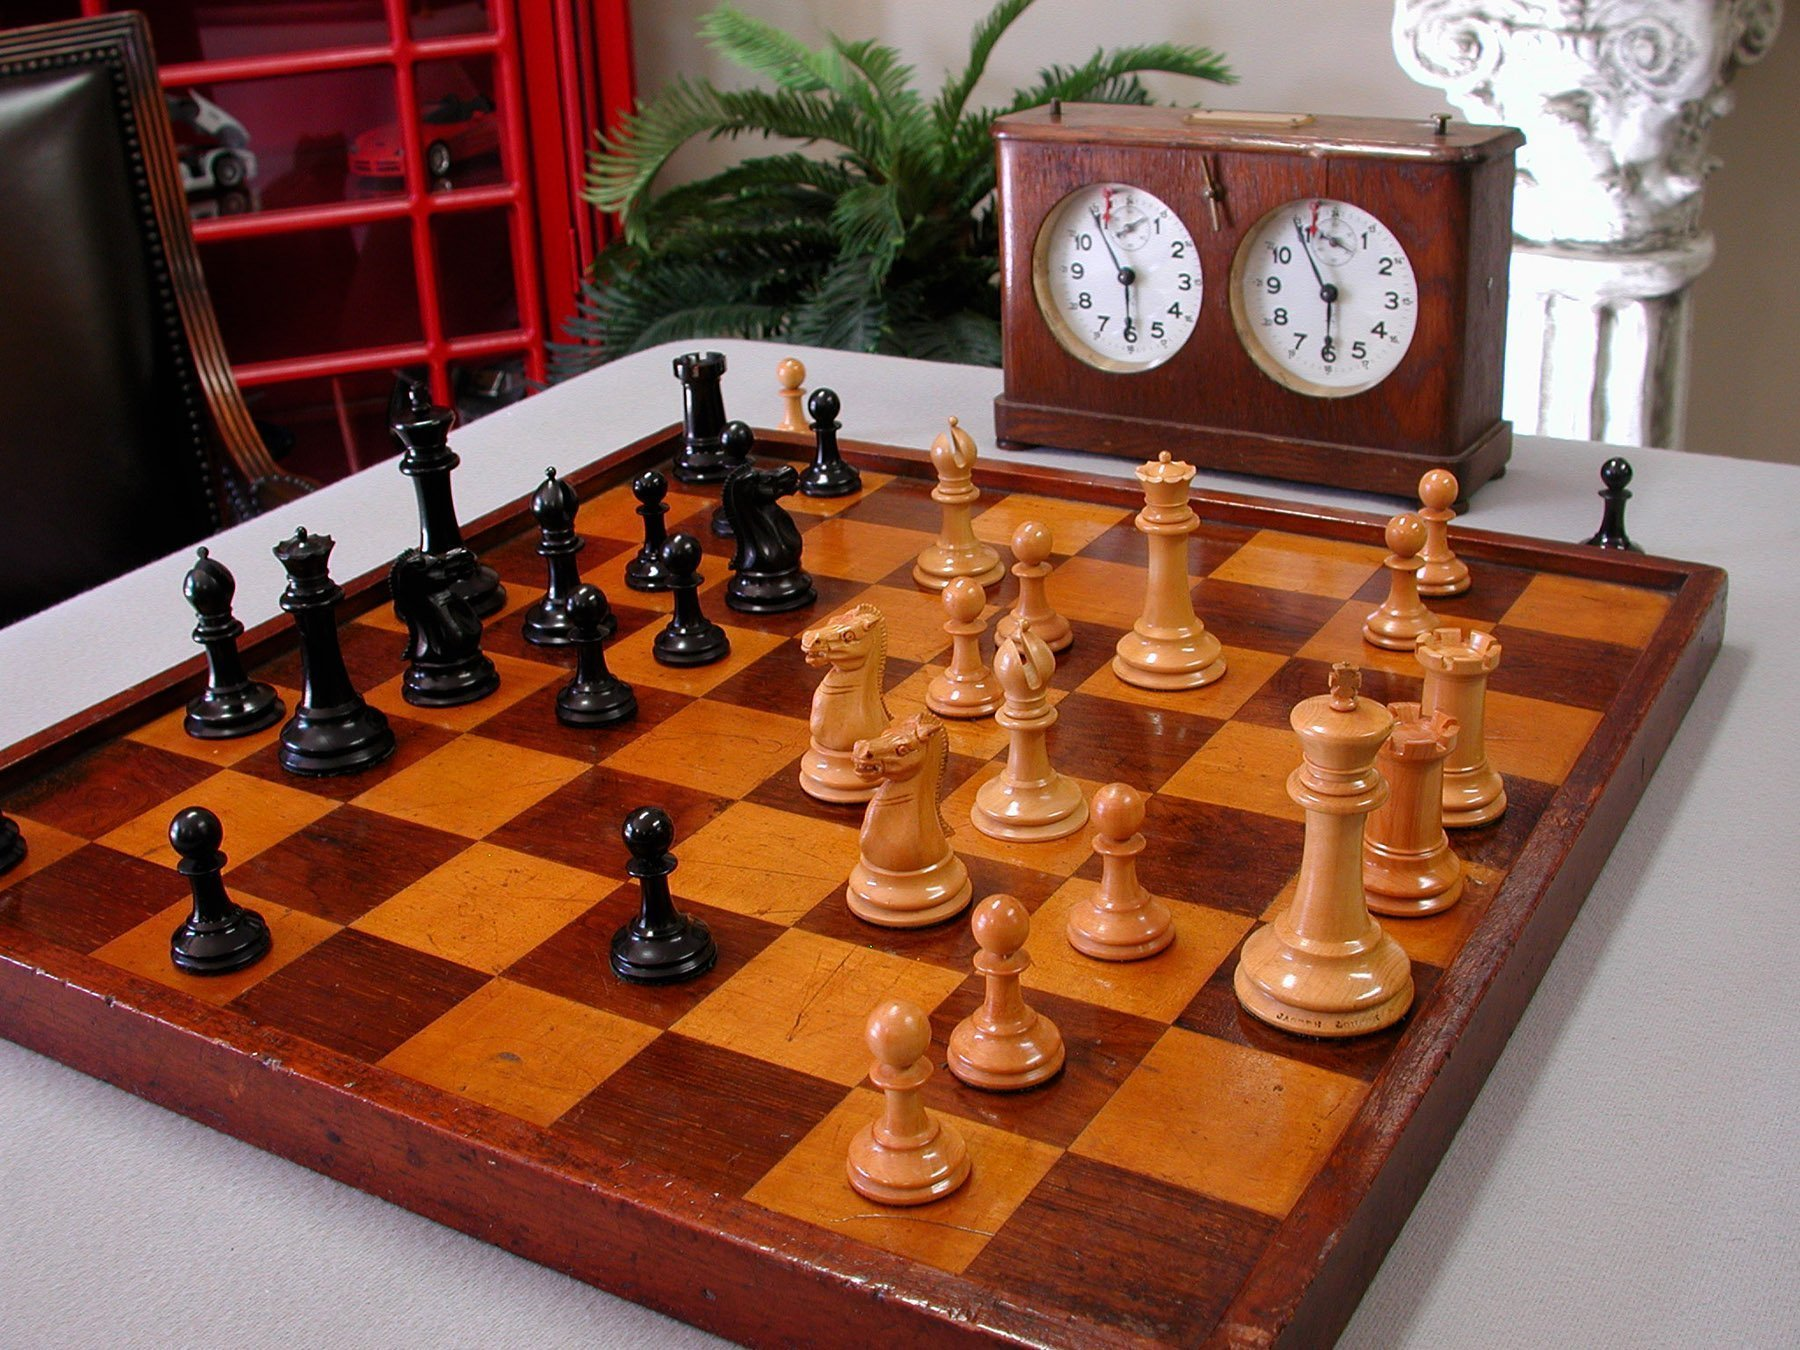 Expensive chessmen